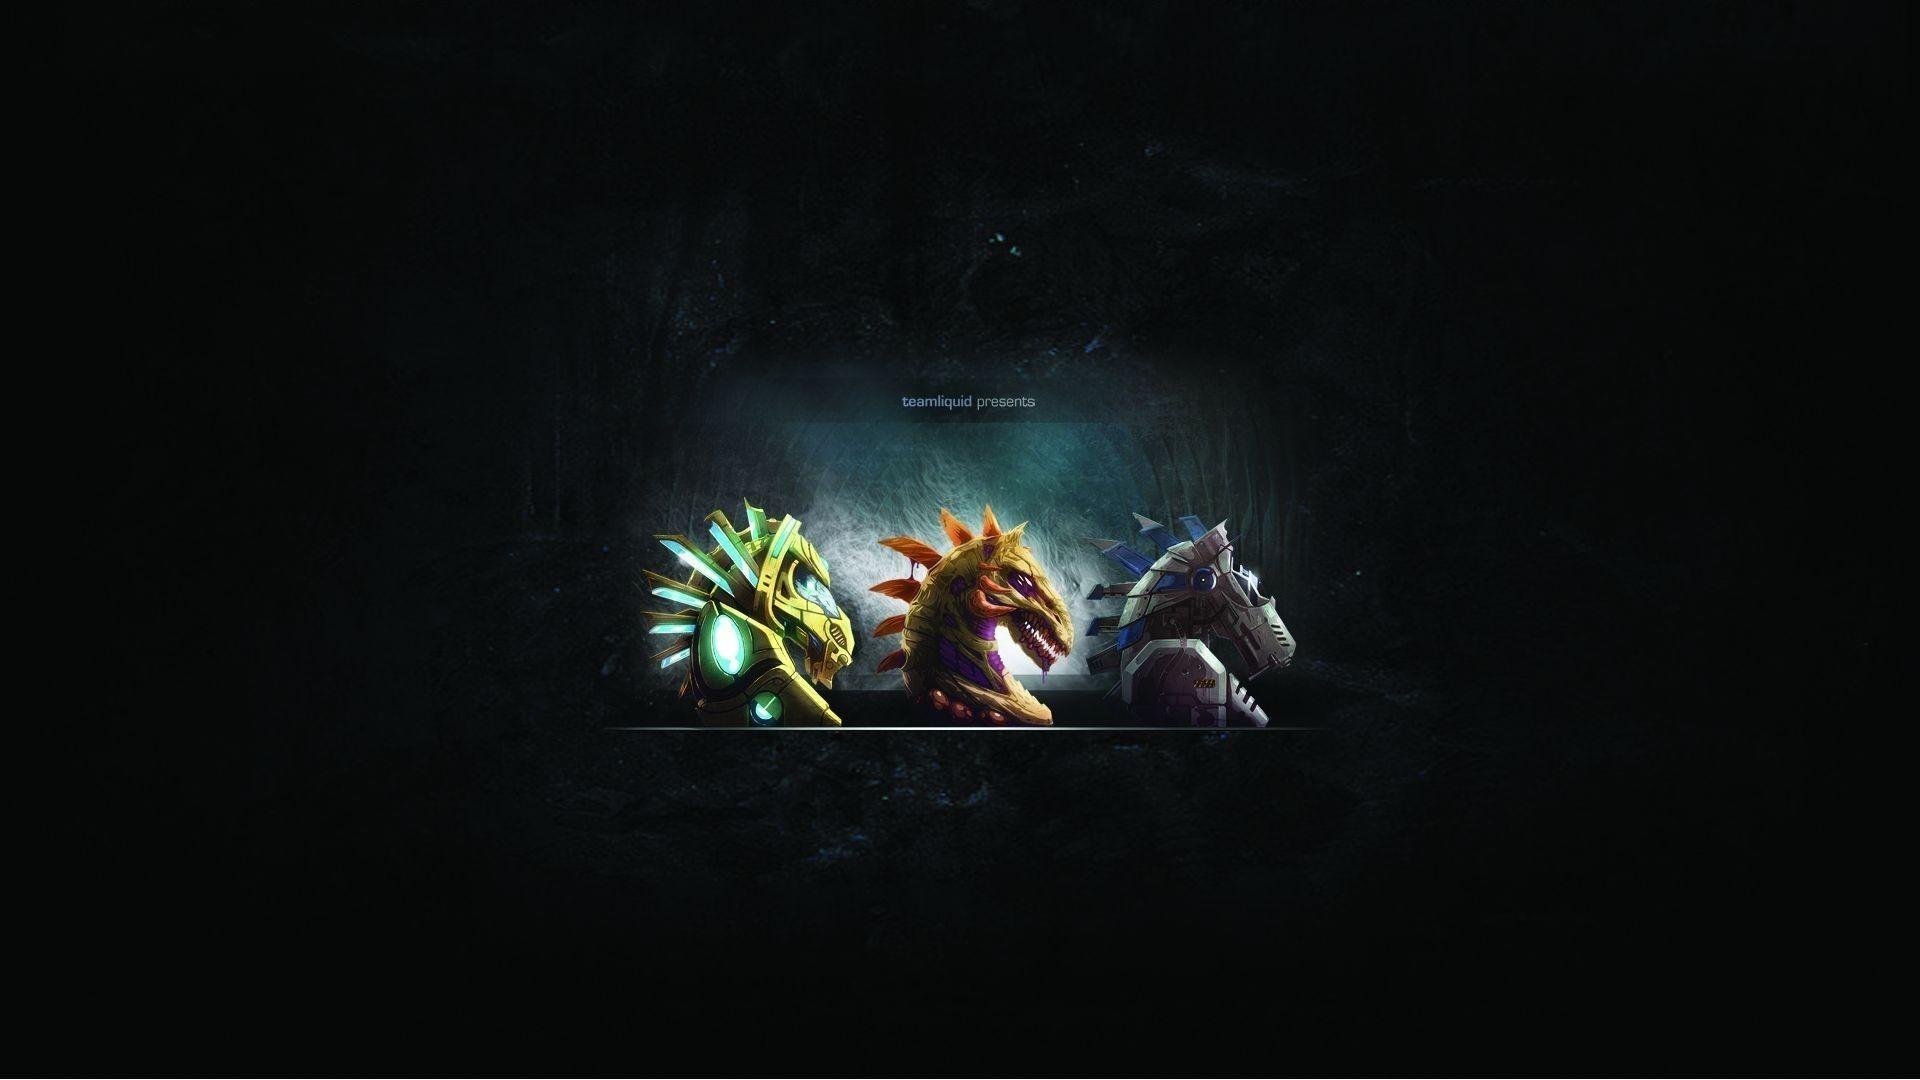 StarCraft, Zerg, Terrans, Protoss Wallpapers HD / Desktop and Mobile  Backgrounds